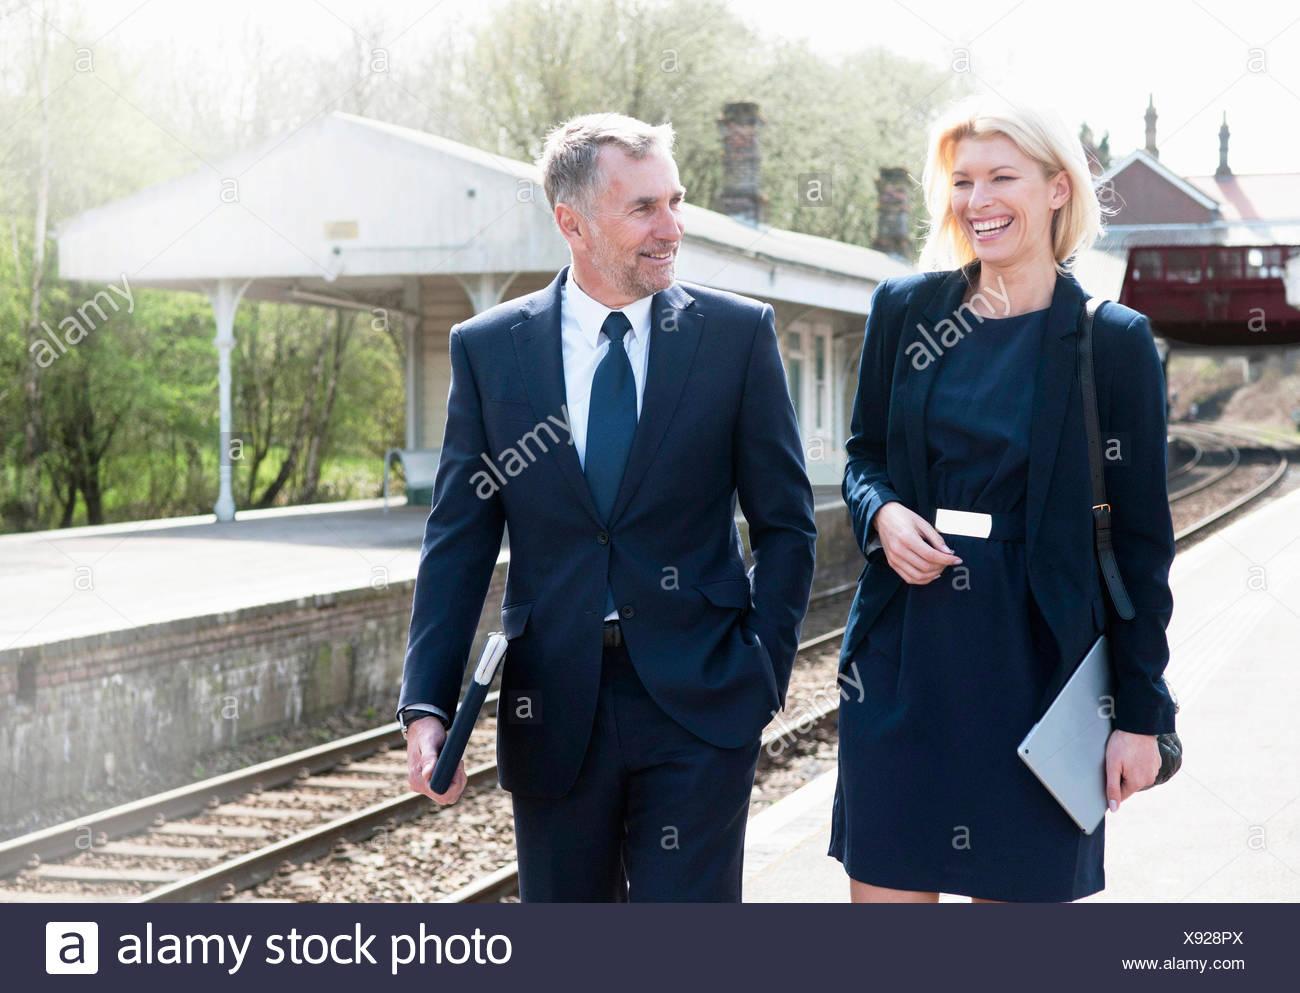 Businessman and woman talking on railway platform - Stock Image